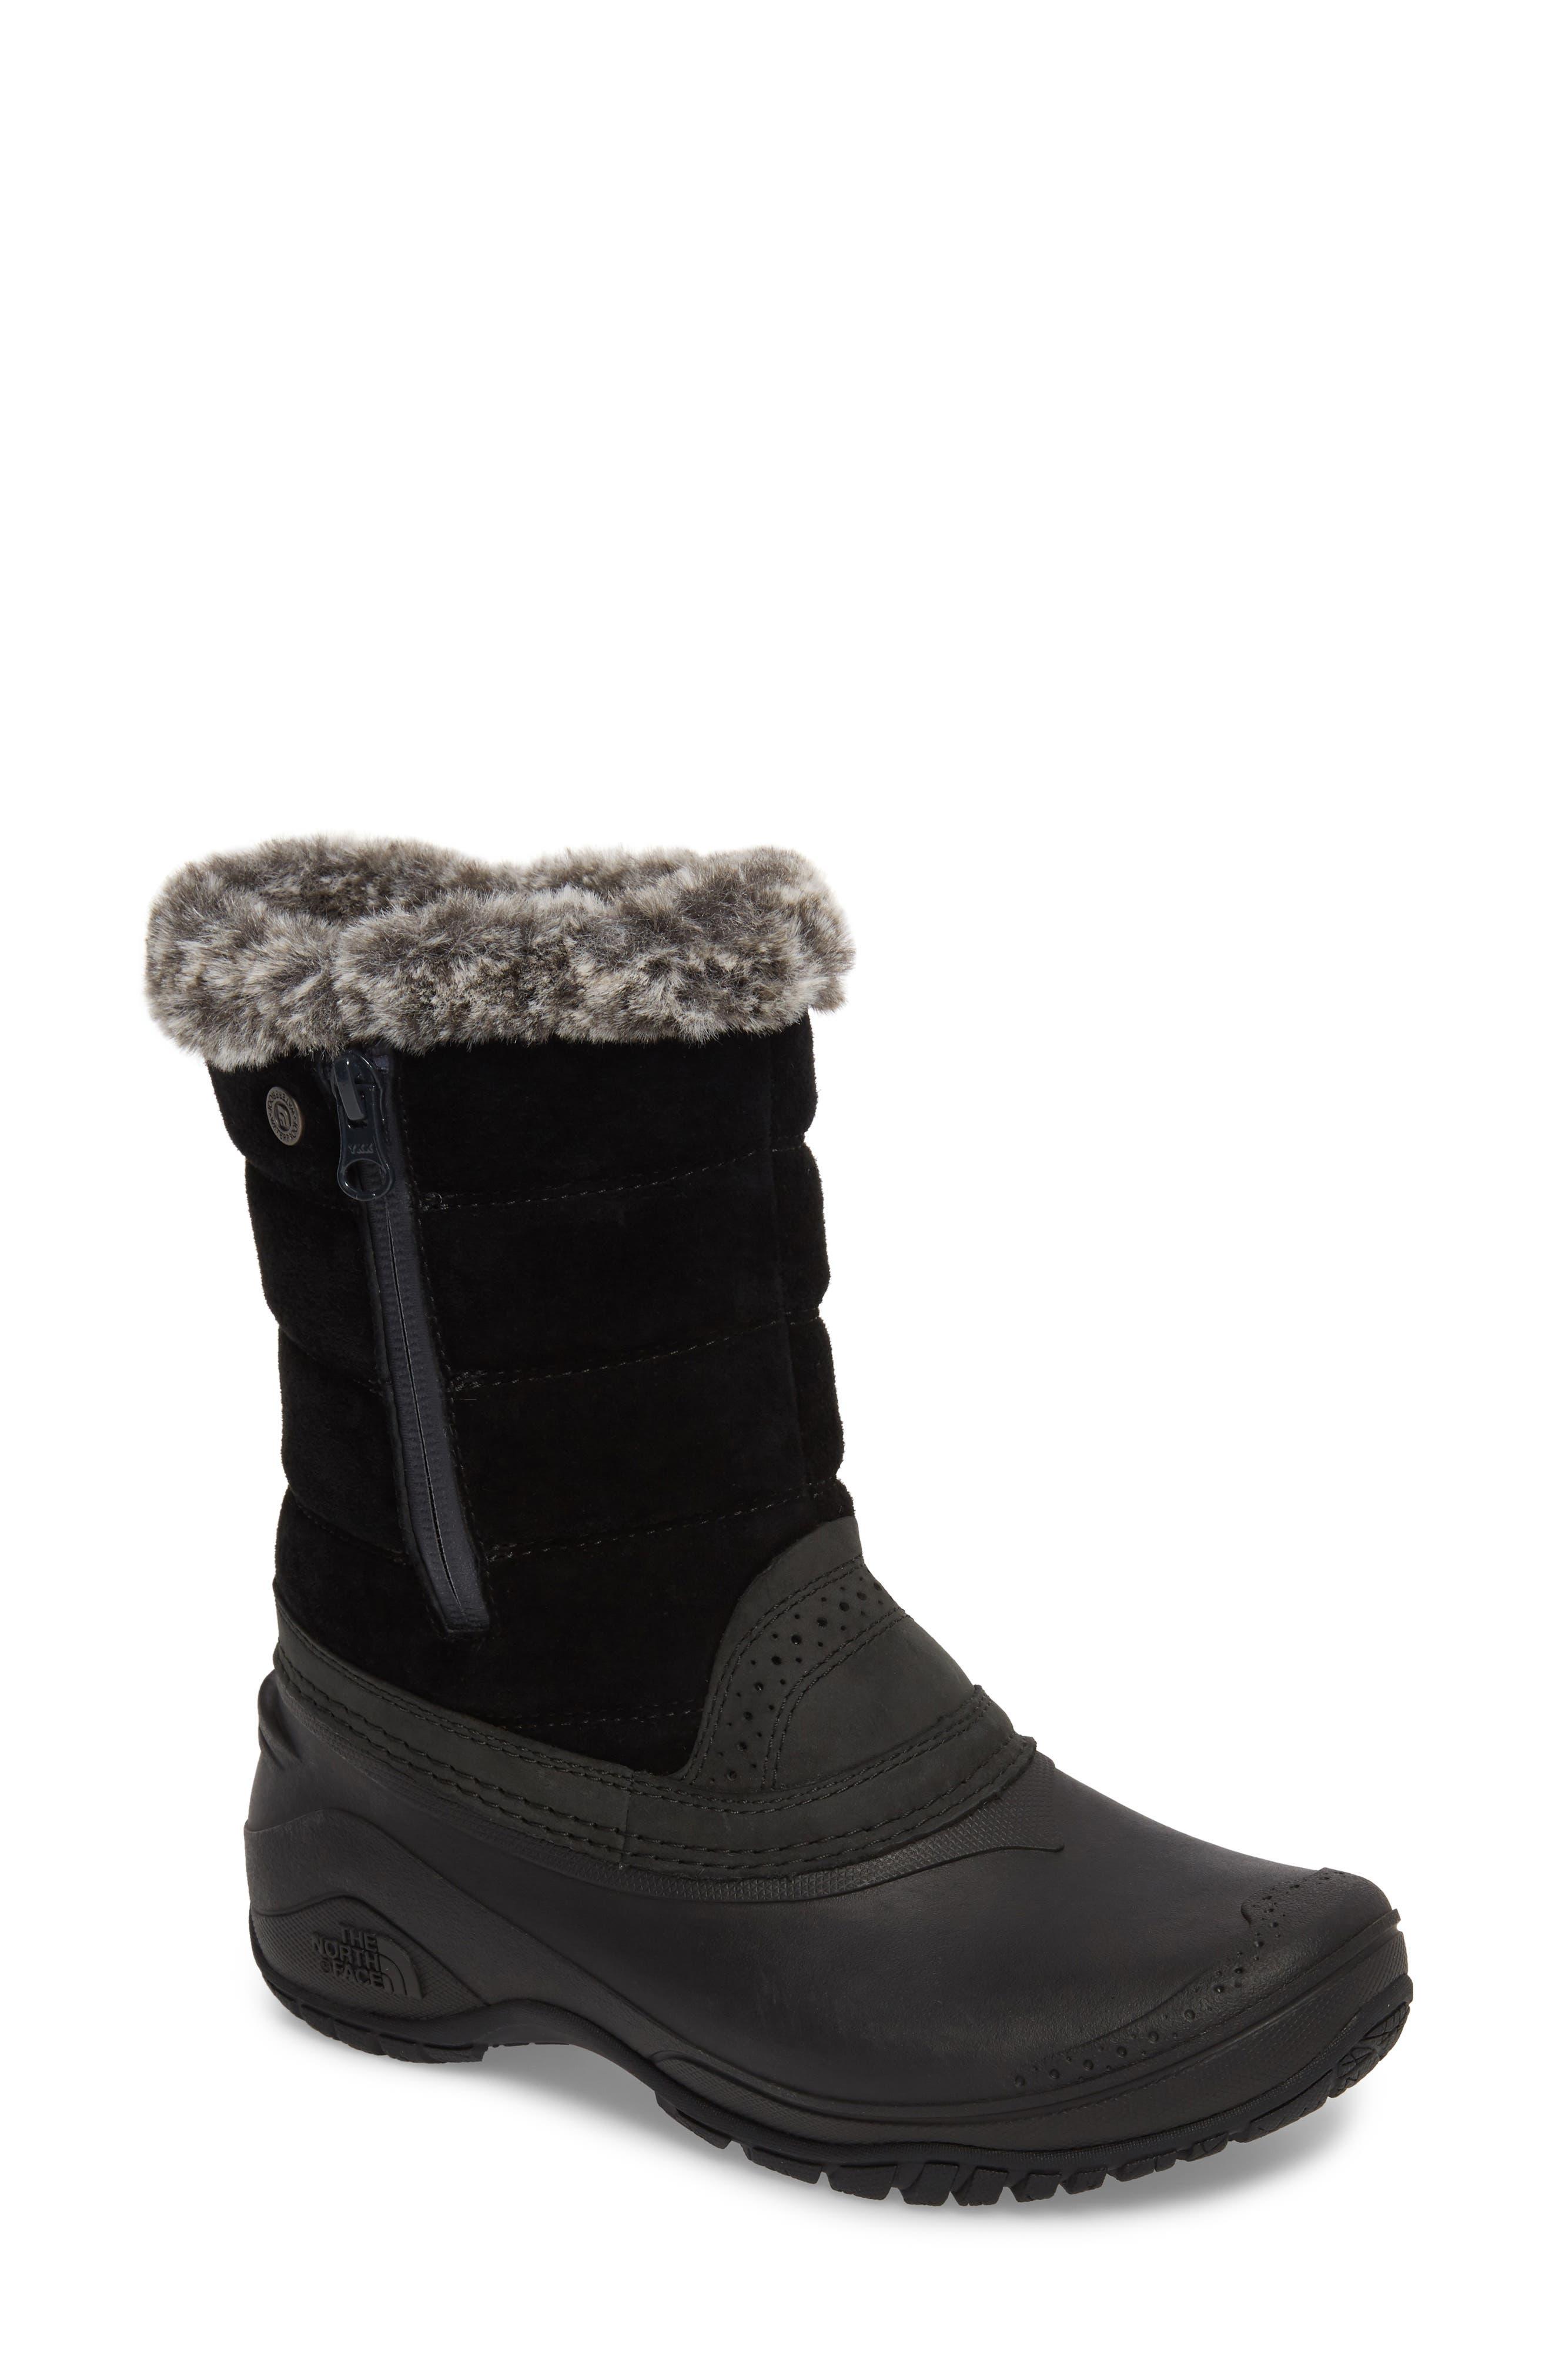 Shellista III Waterproof Pull-On Snow Boot,                             Main thumbnail 1, color,                             Tnf Black